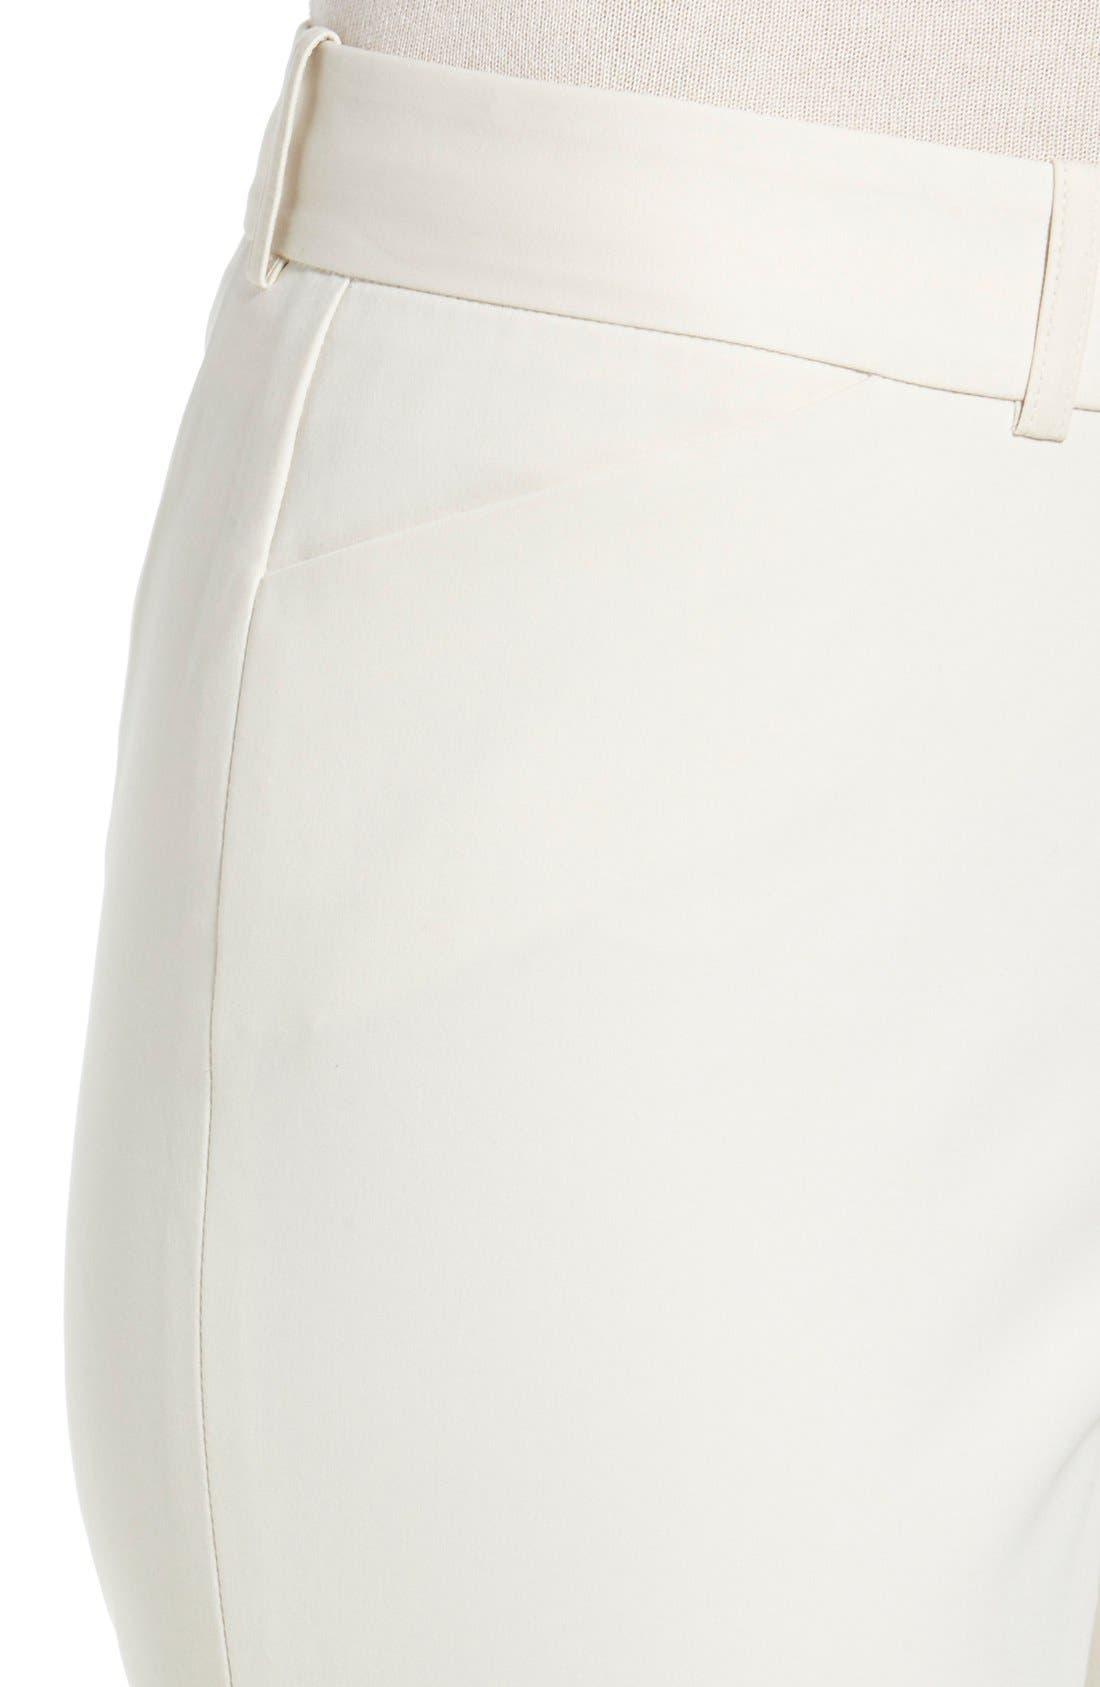 'Downtown' Stretch Cotton Blend Cuff Ankle Pants,                             Alternate thumbnail 5, color,                             265